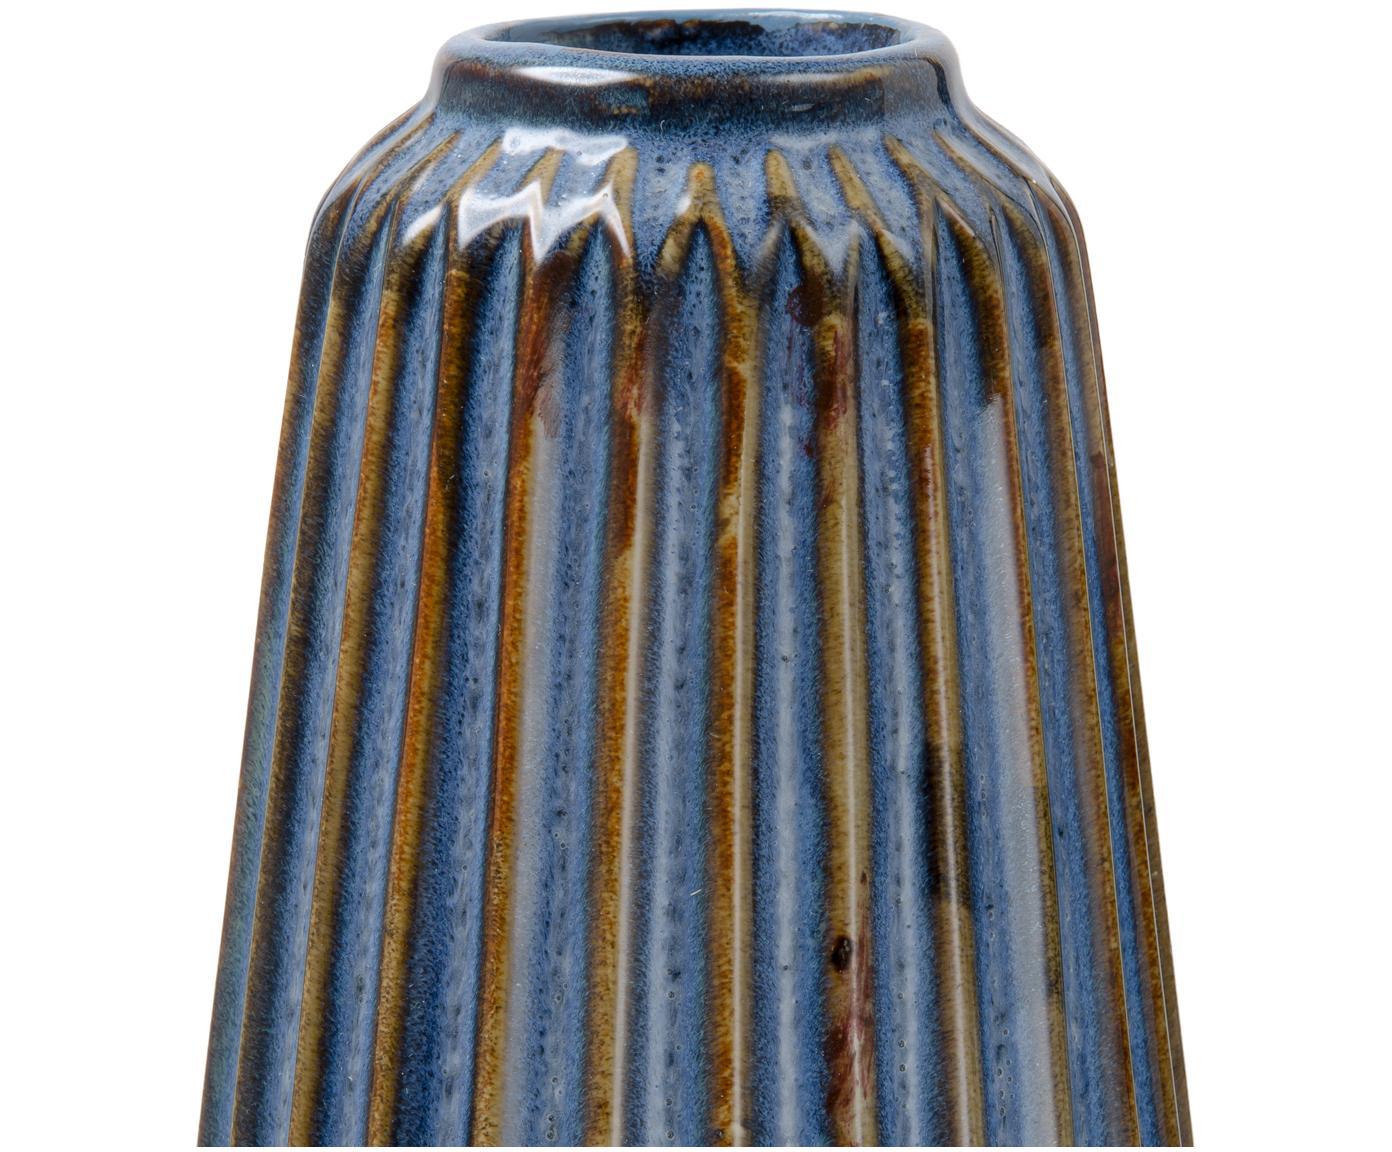 Set de jarrones de cerámica Aquarel, 3pzas., Porcelana, Tonos azules con degradado, Tamaños diferentes